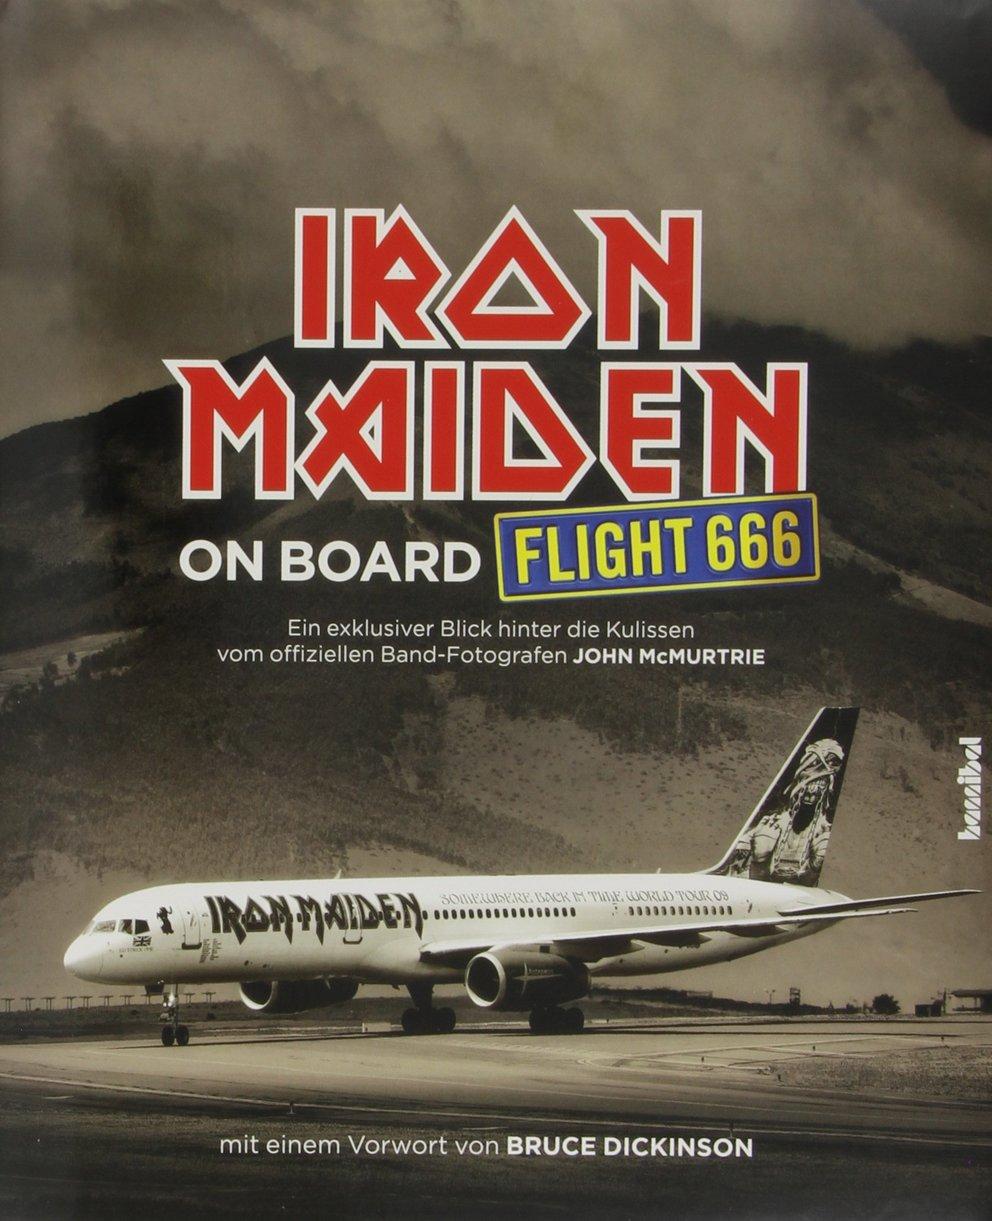 zahlen bedeutung flight 666 iron maiden buchcover